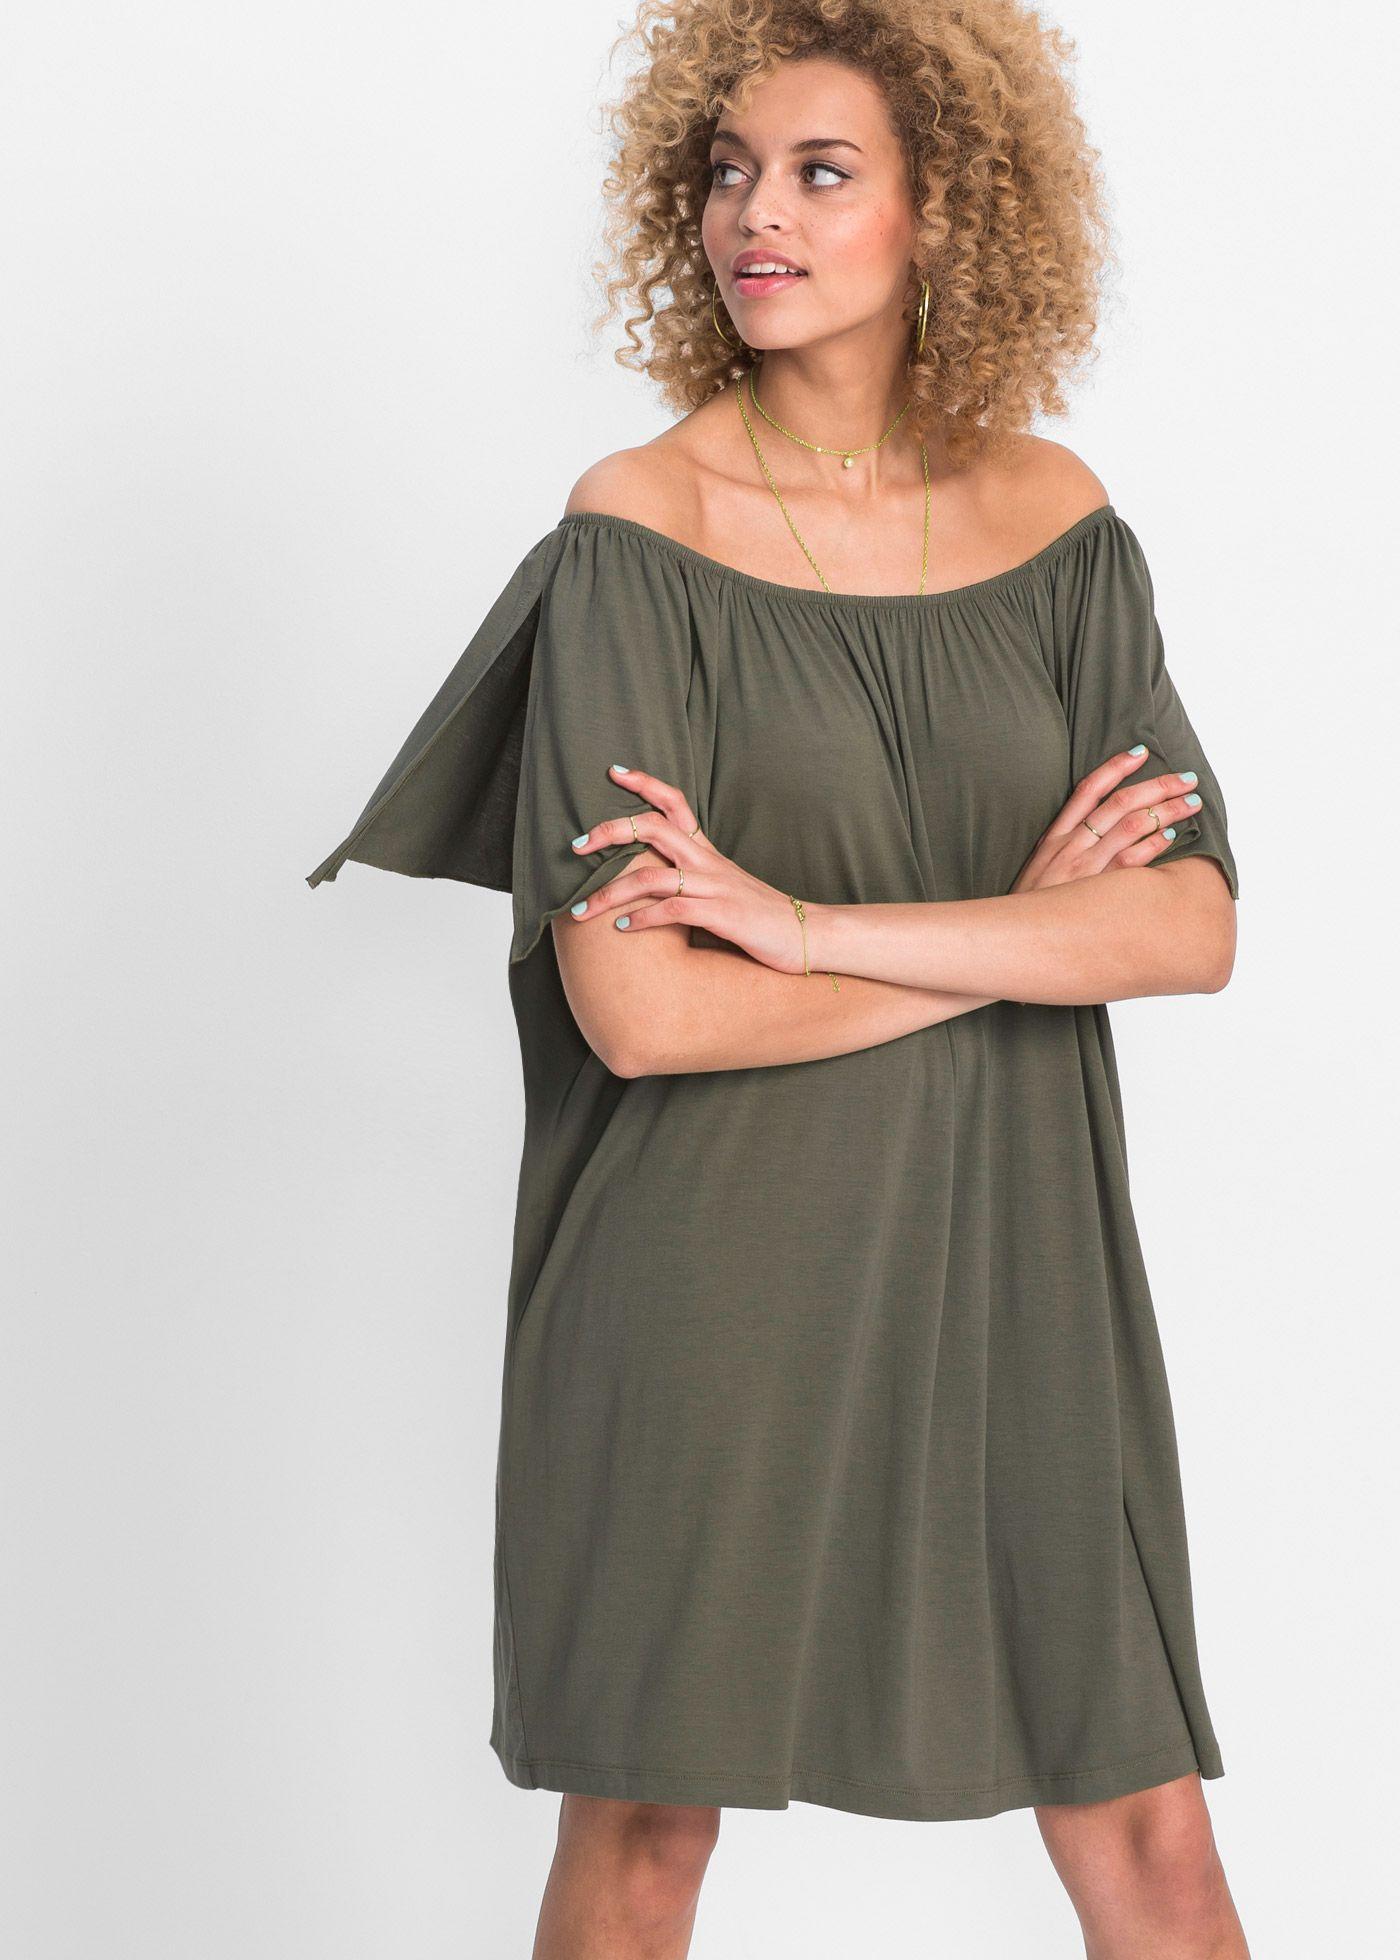 Must Have: Shirtkleid mit Carmenausschnitt in trendigem khaki